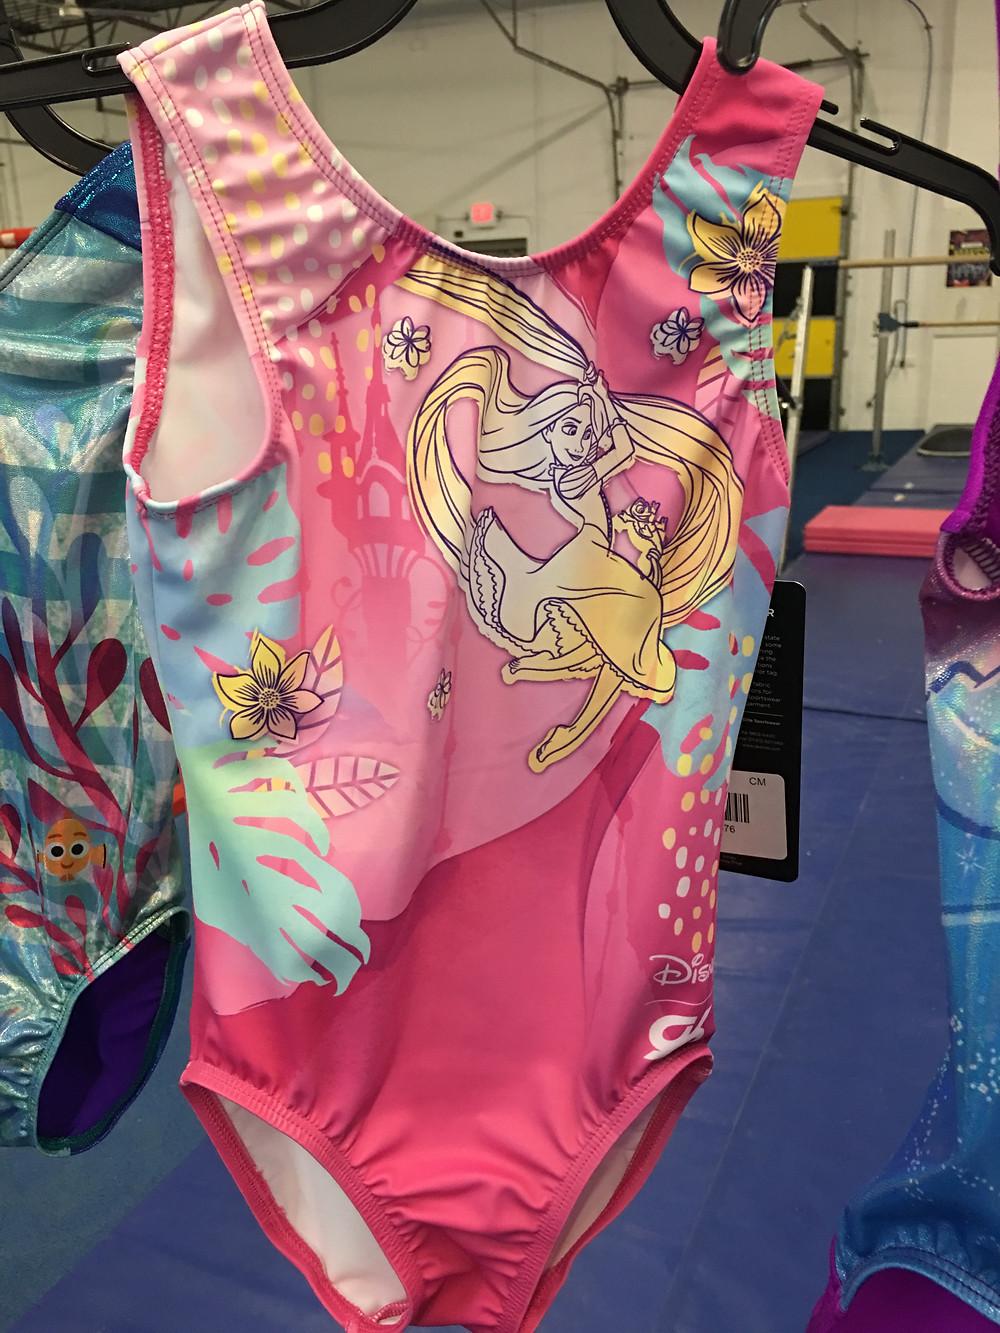 Rapunzel theme...hair scrunchy sold separately!